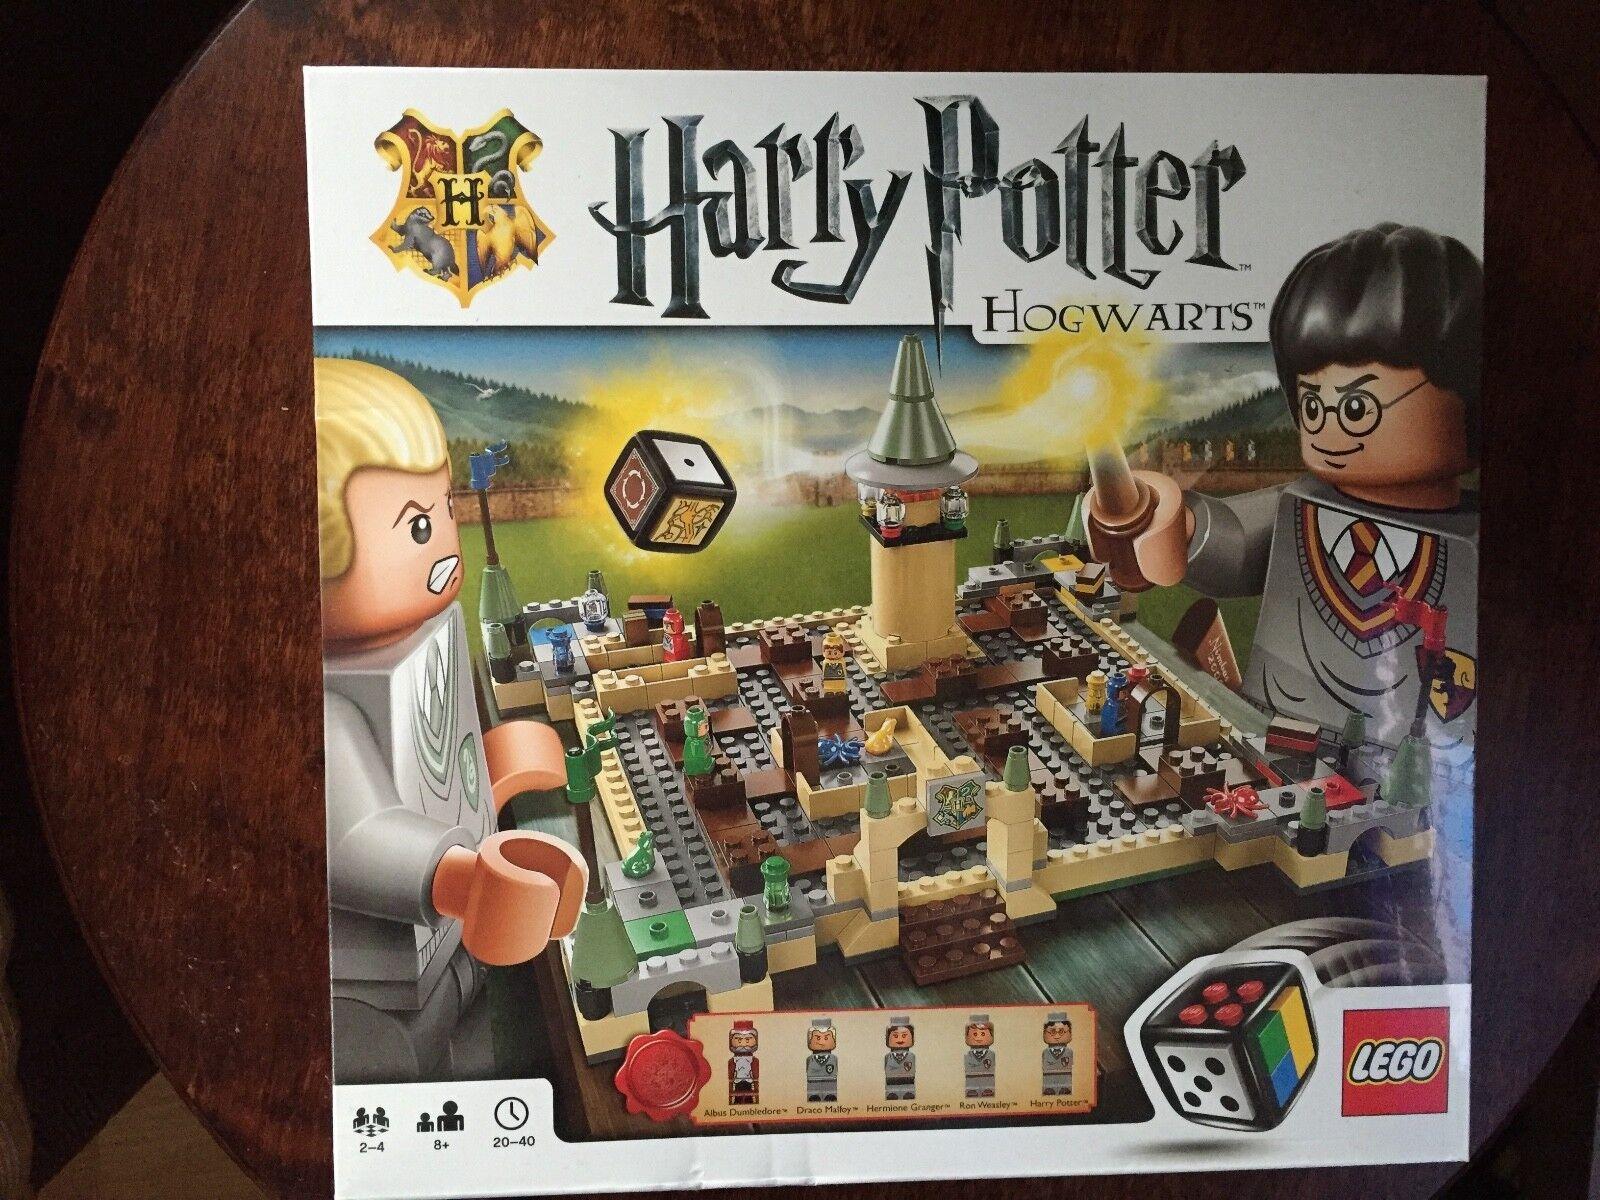 LEGO 3862 - HarryPotter - Hogwarts - wie neu